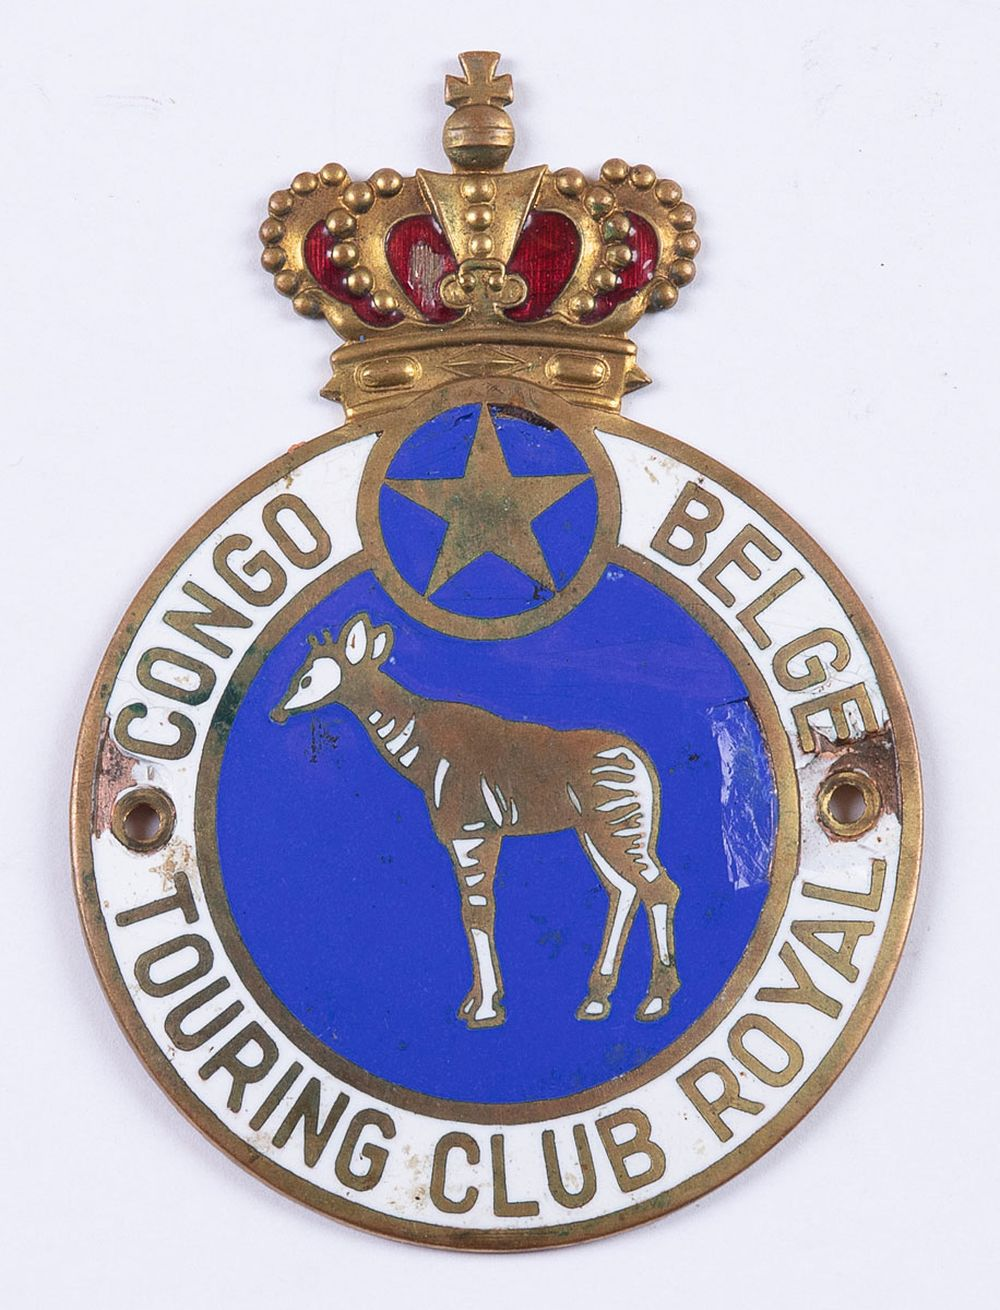 [AUTOMOBILE] CONGO BELGE TOURING CLUB ROYAL. Badge pour